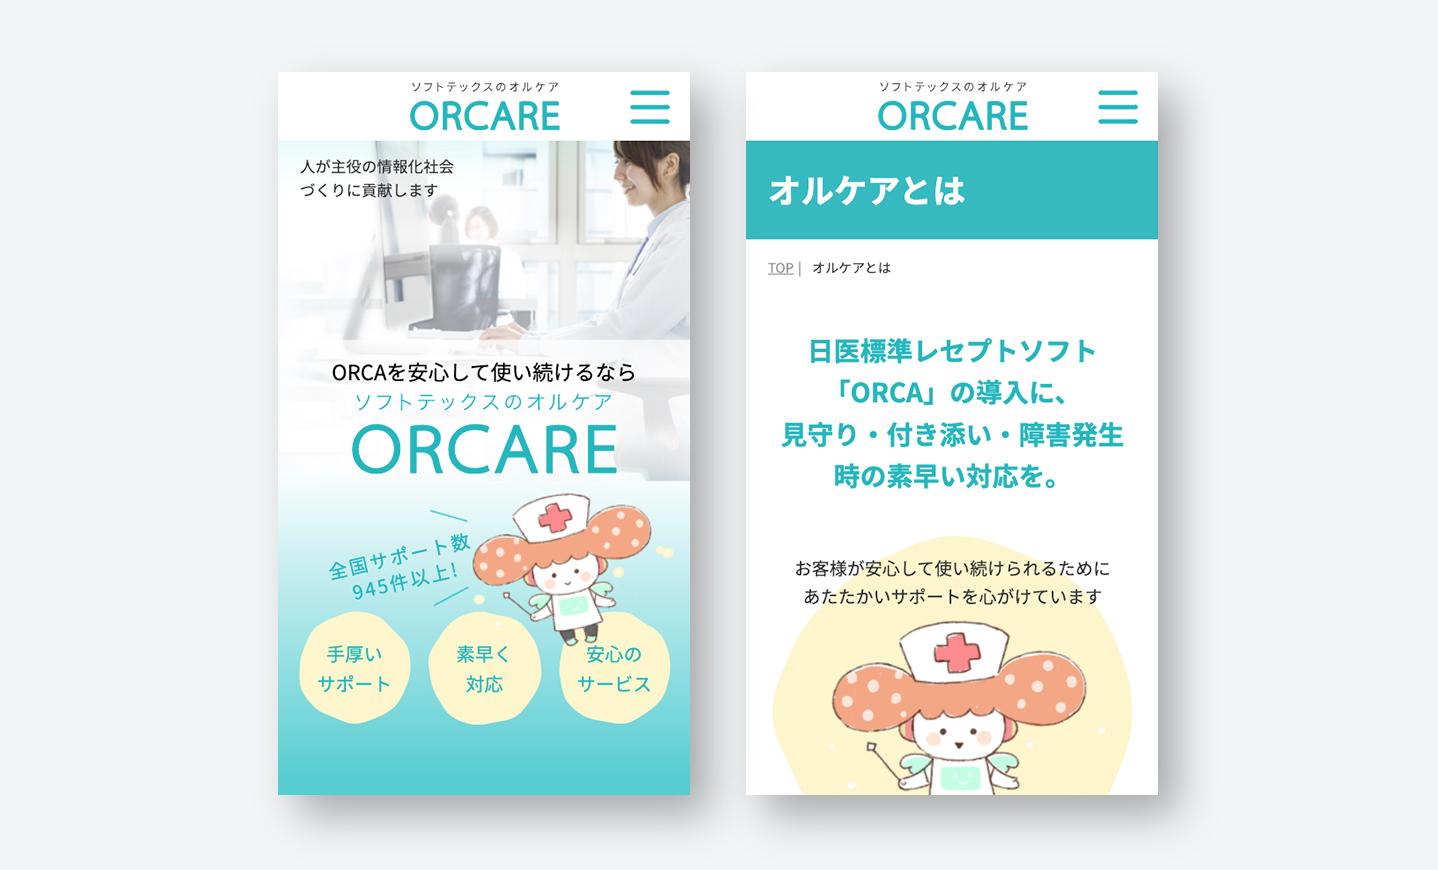 ORCAREサイト スマートフォン表示